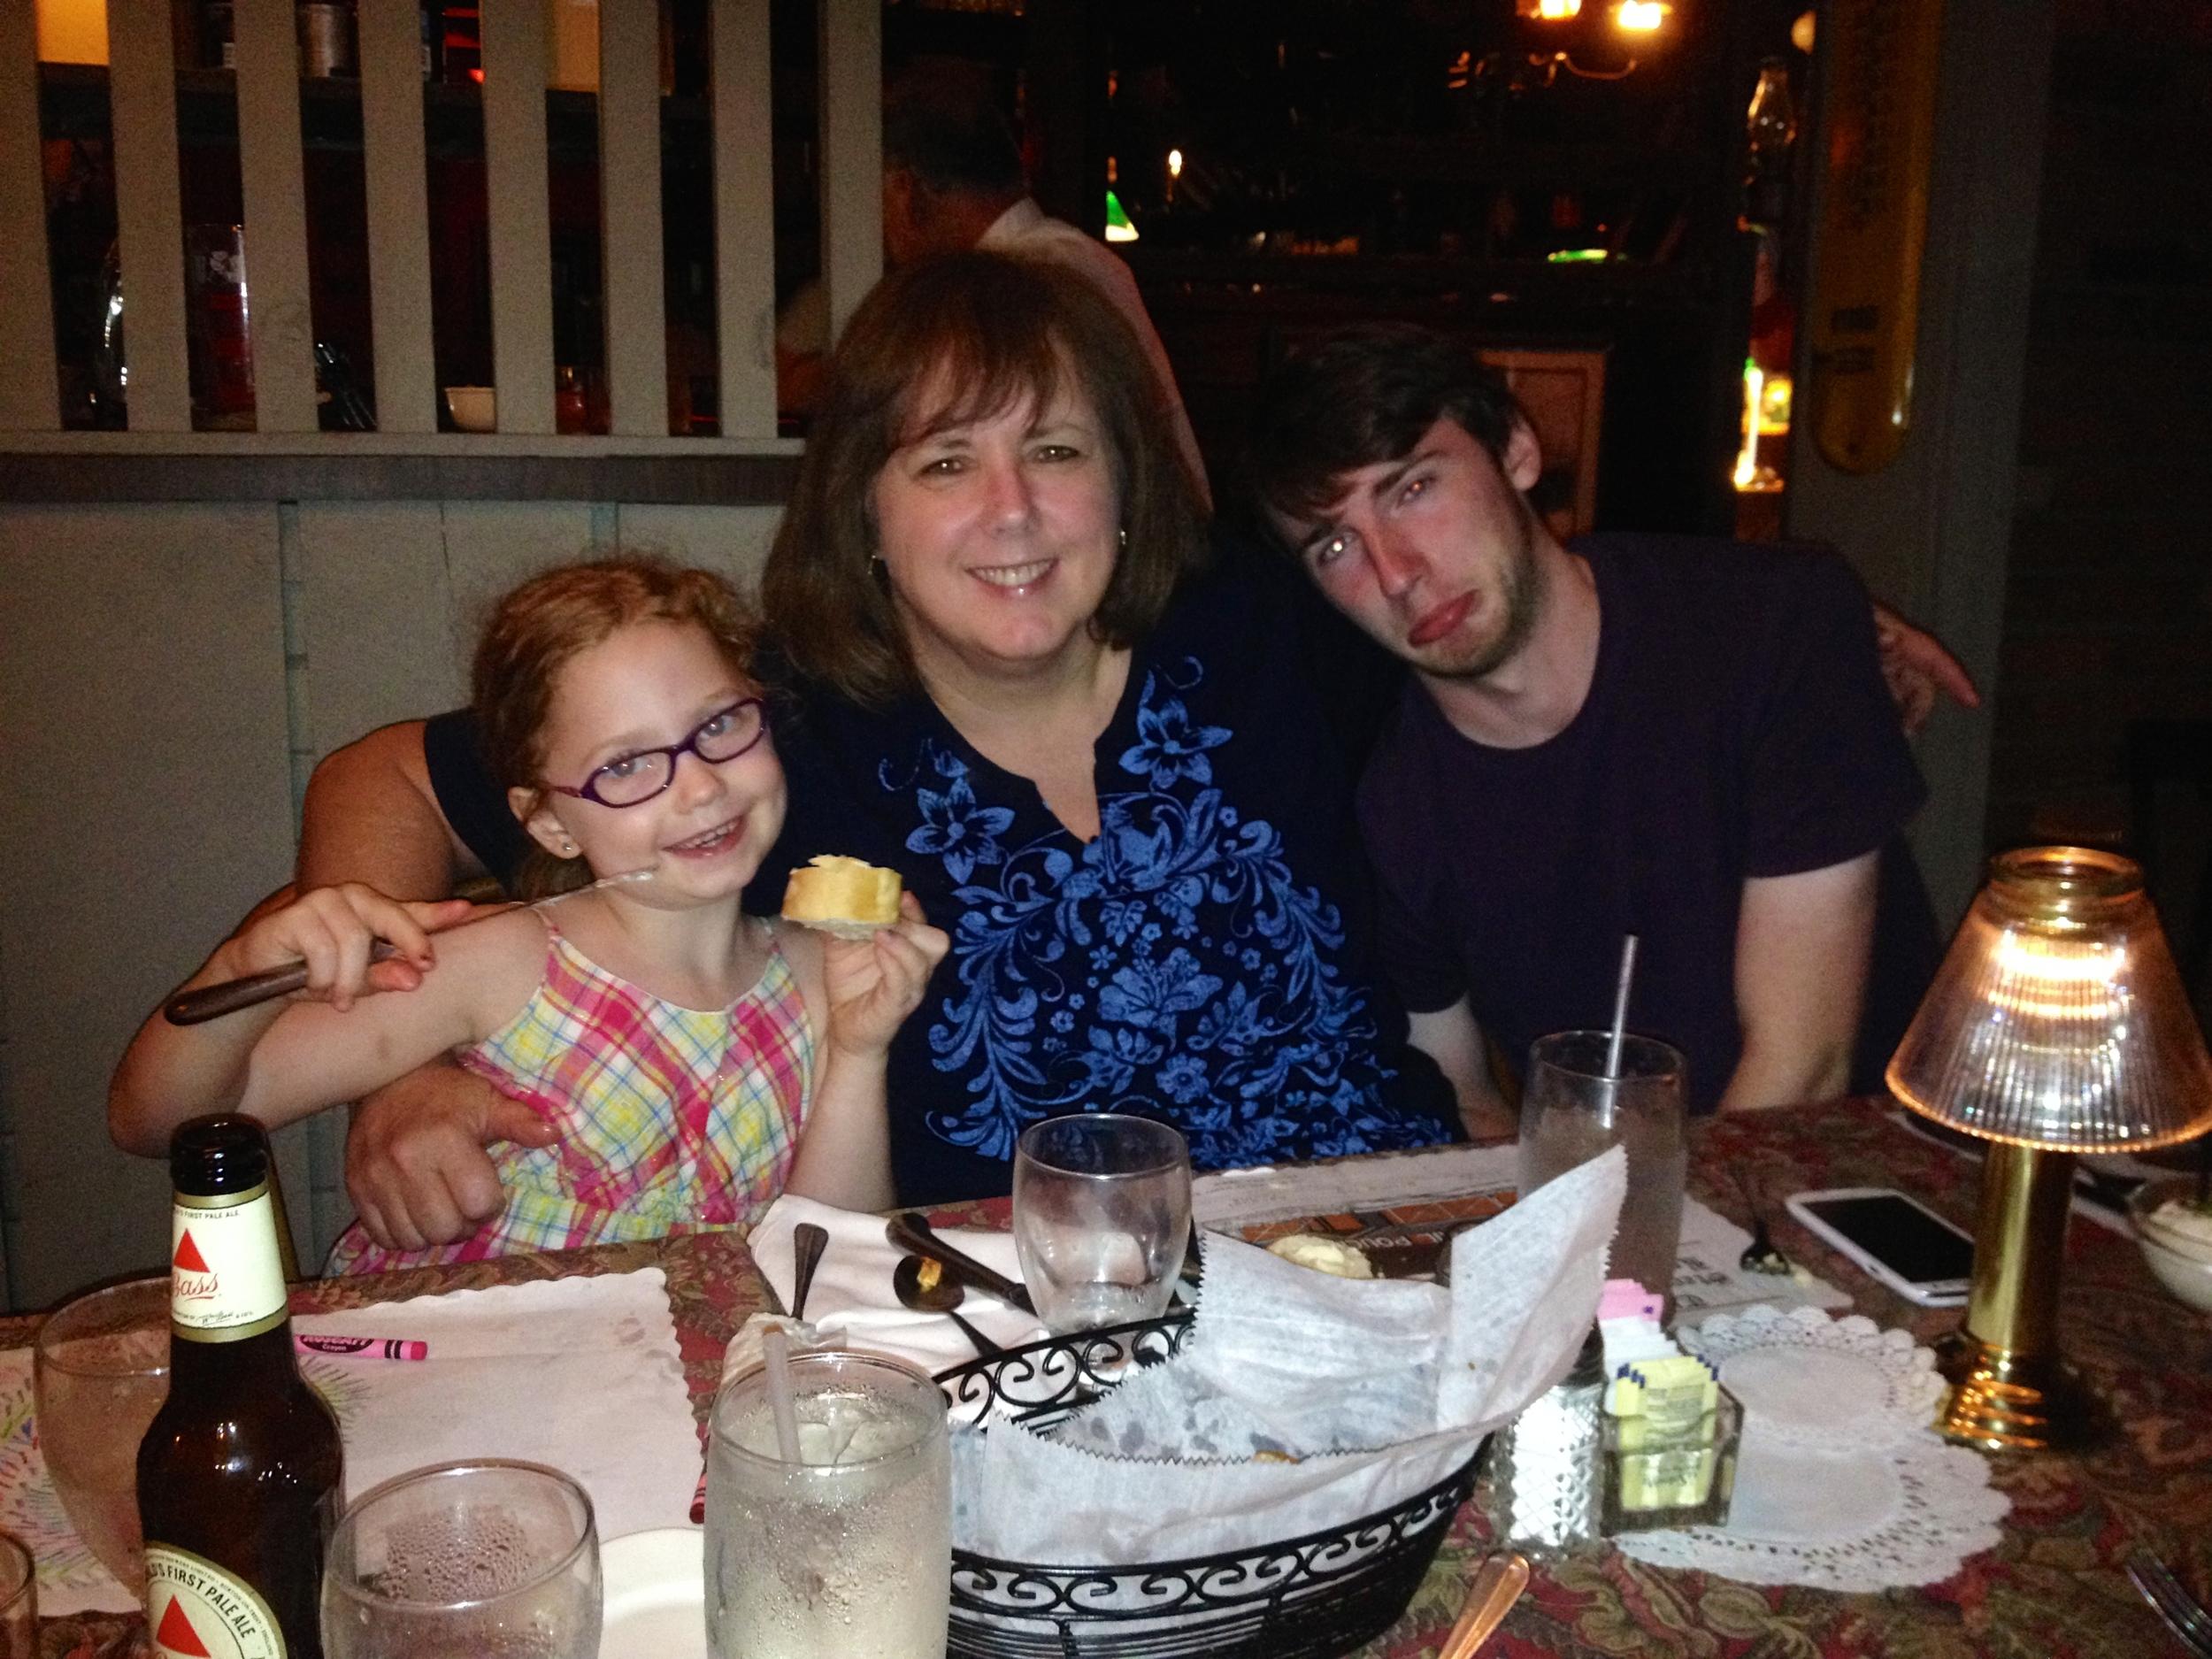 Seth was sad Nori and Grammy ate all the garlic toast!